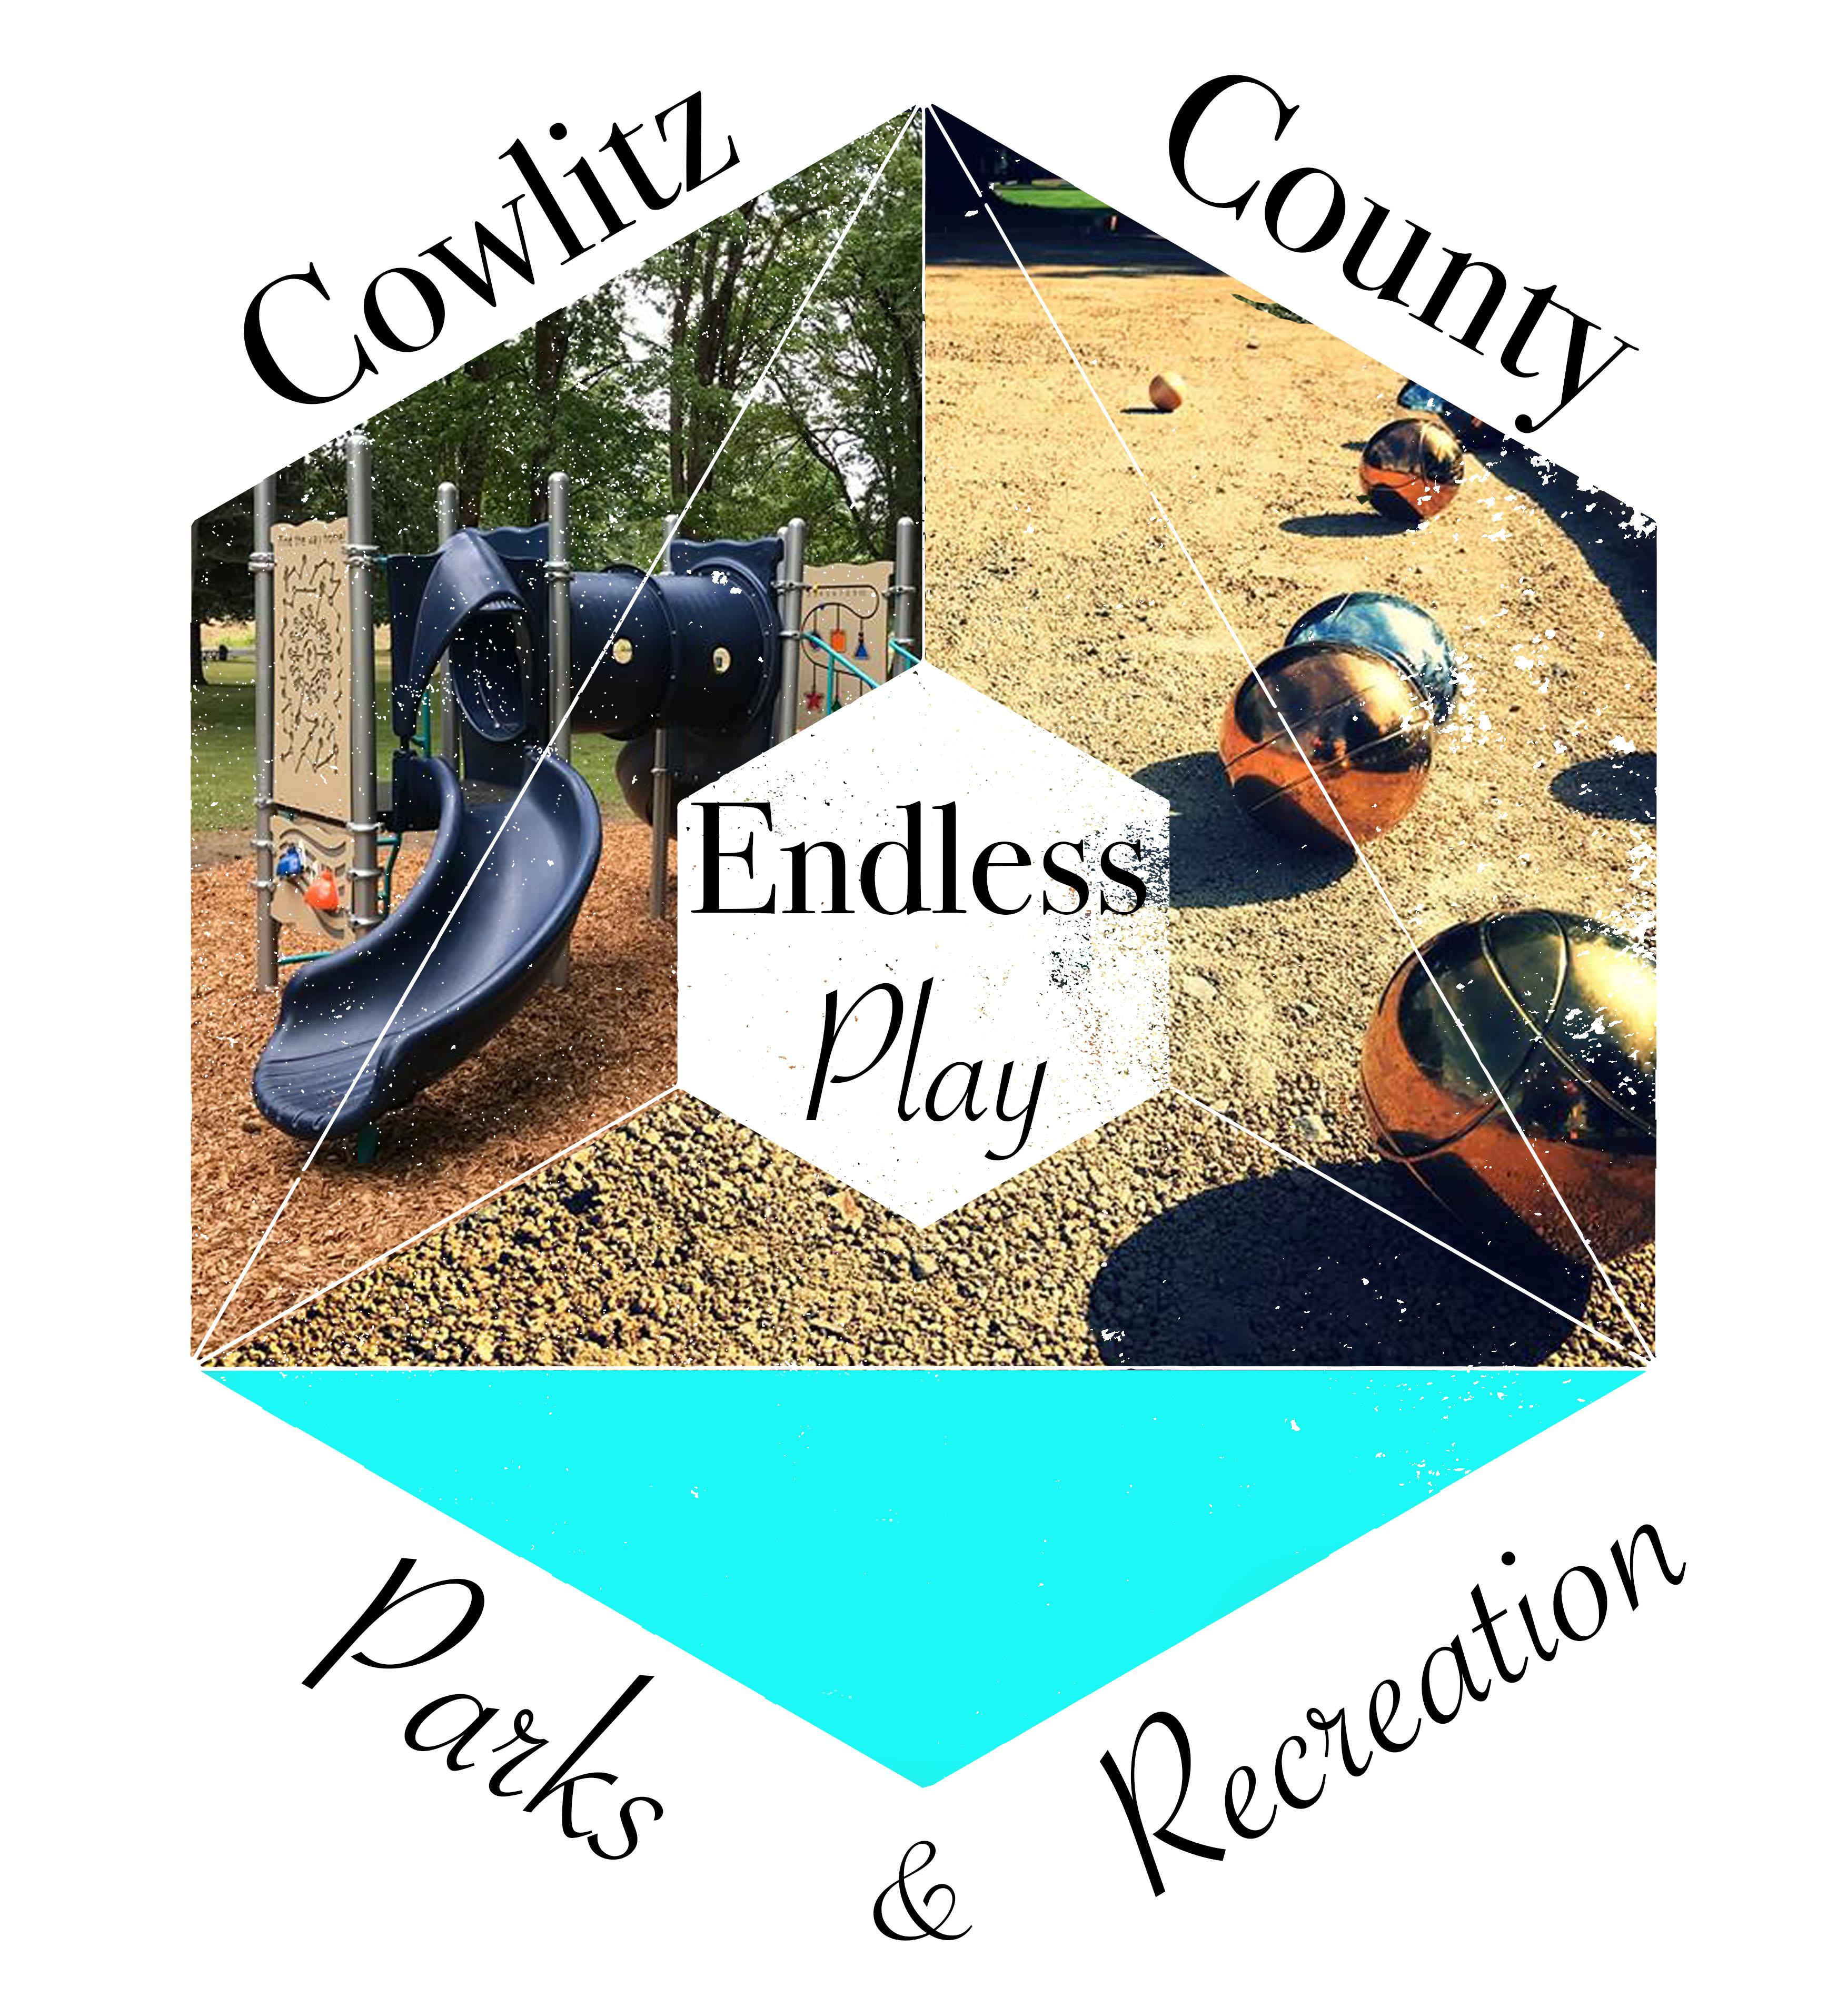 Cowlitz County, WA - Official Website - Parks & Recreation